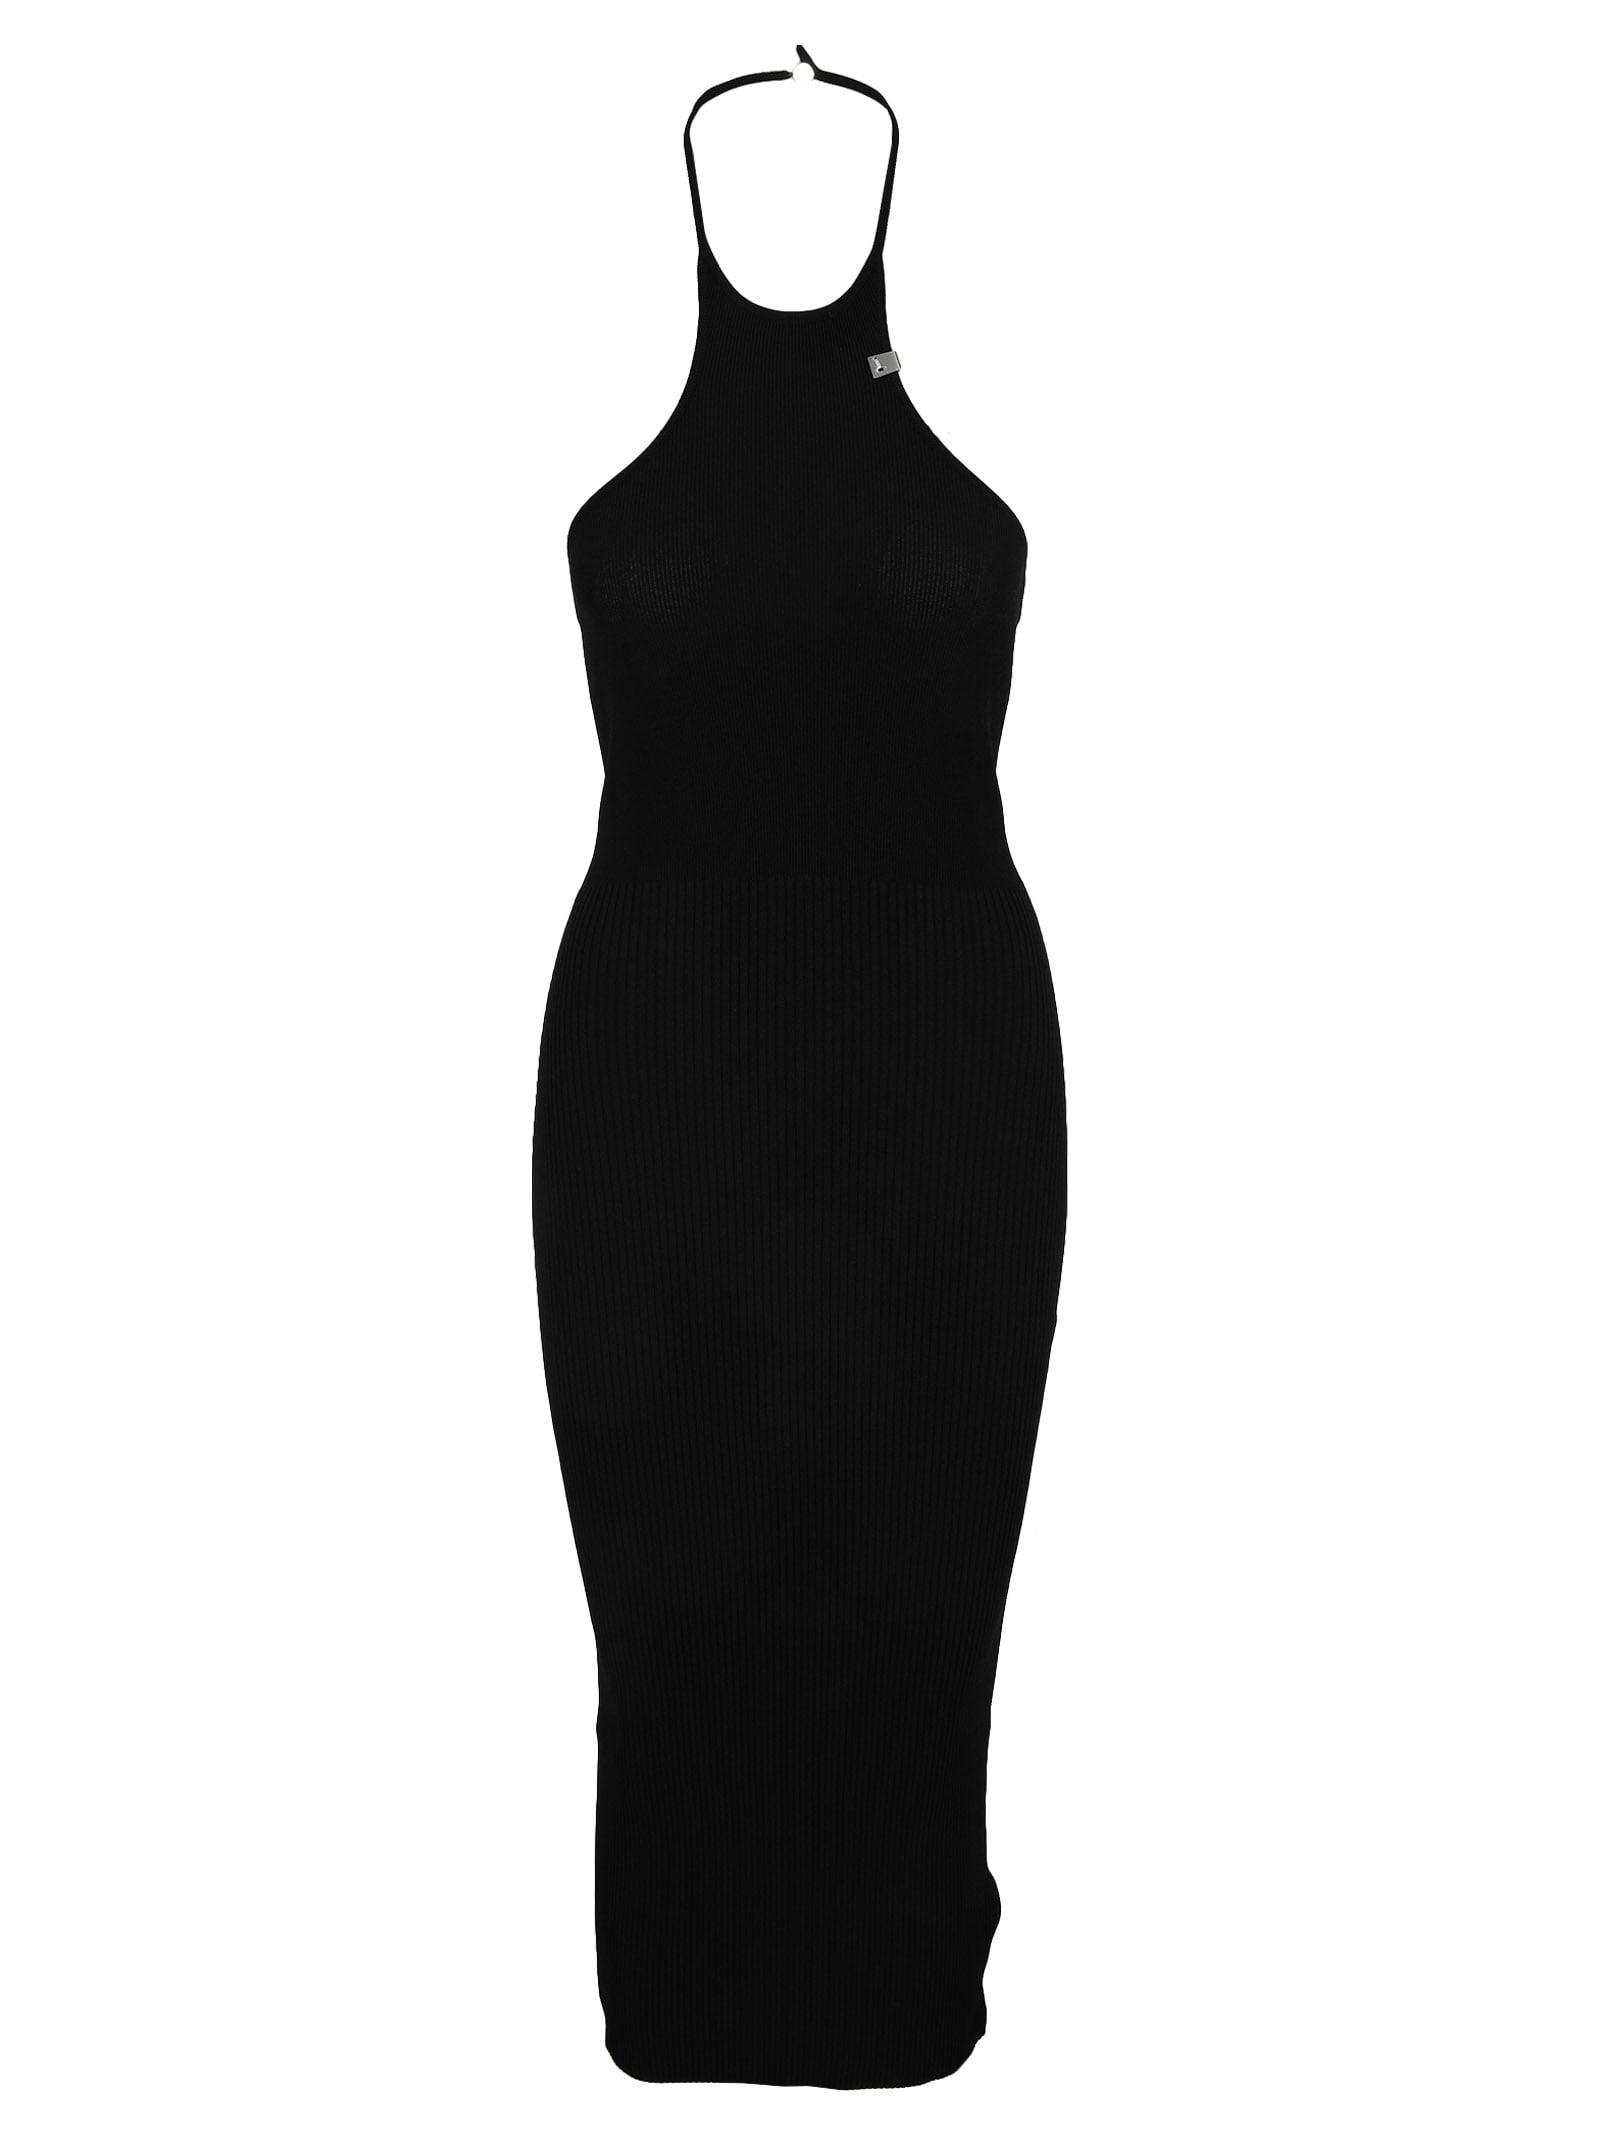 Buy 1017 ALYX 9SM Alyx Ribbed Knit Tank Dress online, shop 1017 ALYX 9SM with free shipping